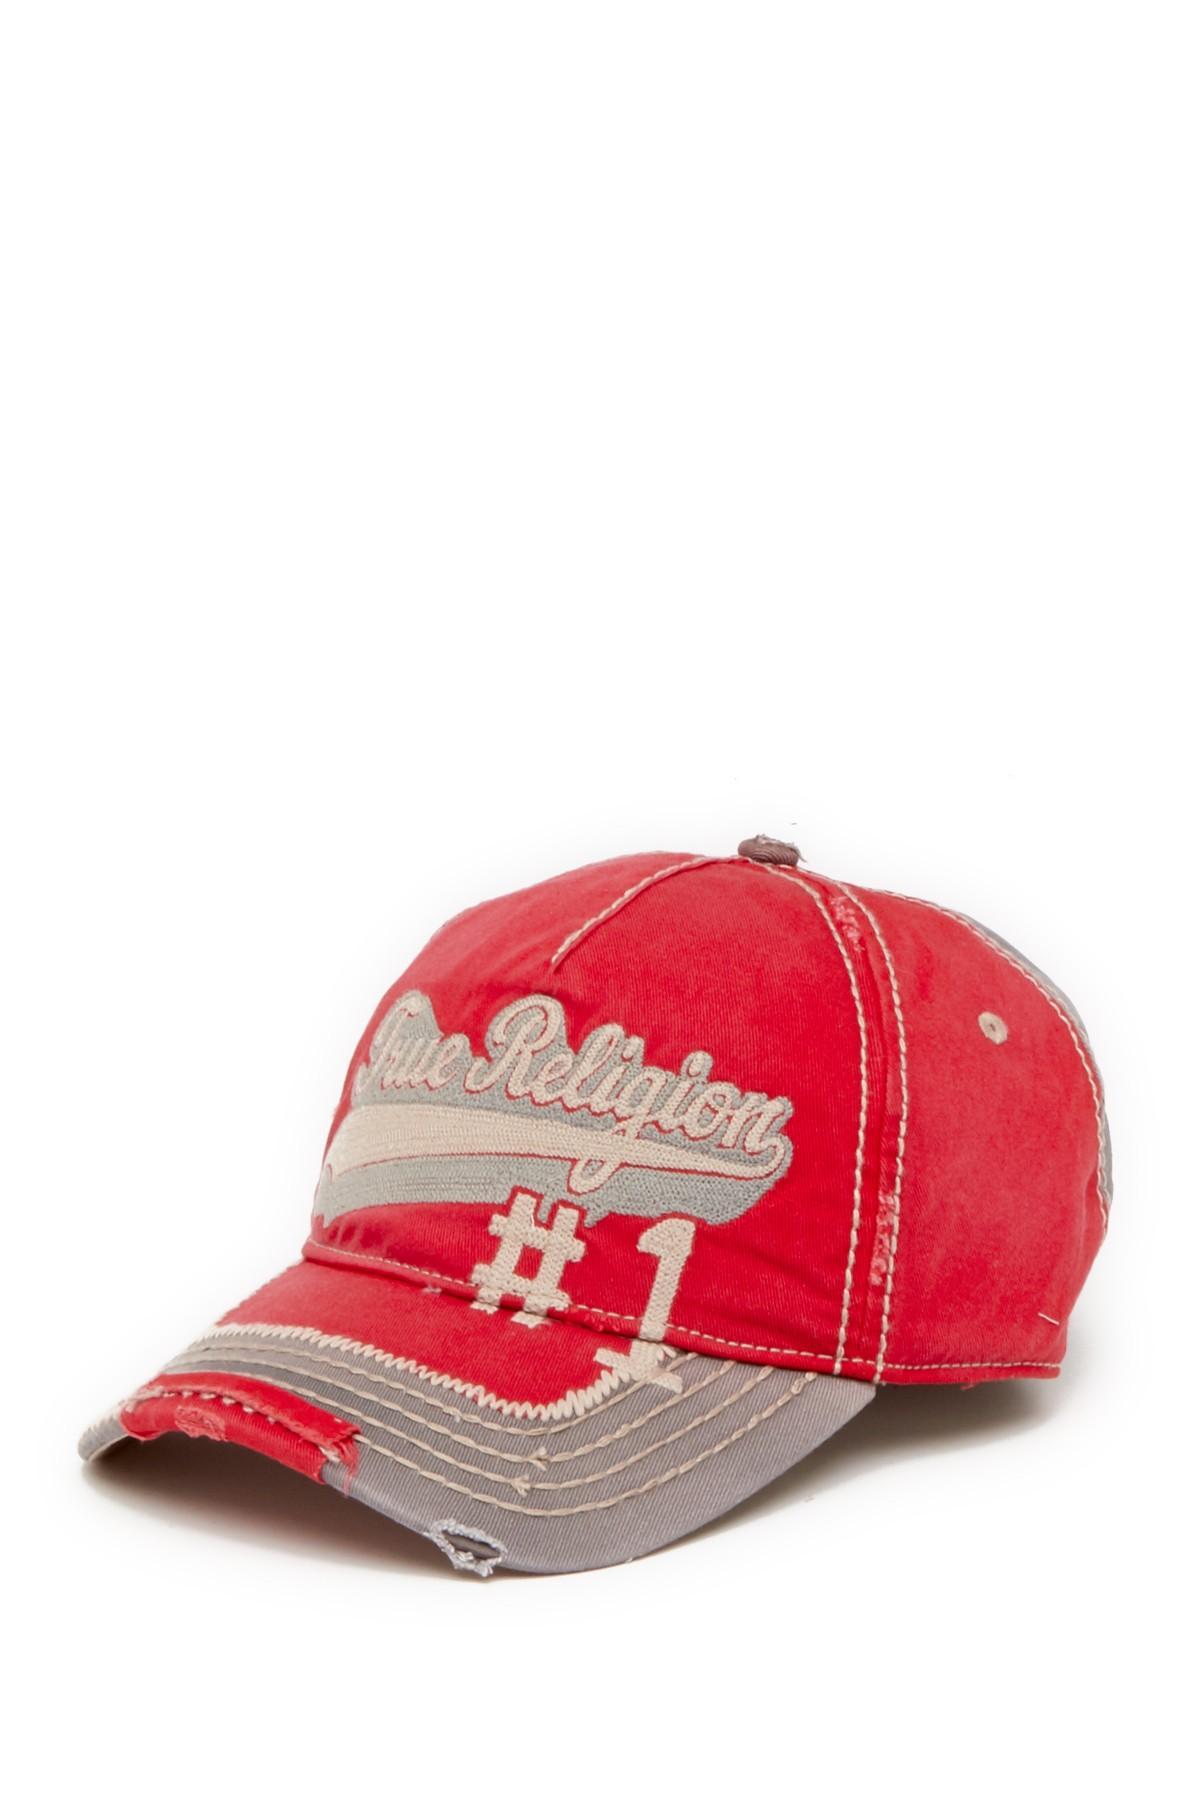 a068b75c Lyst - True Religion 'script' Baseball Cap in Red for Men